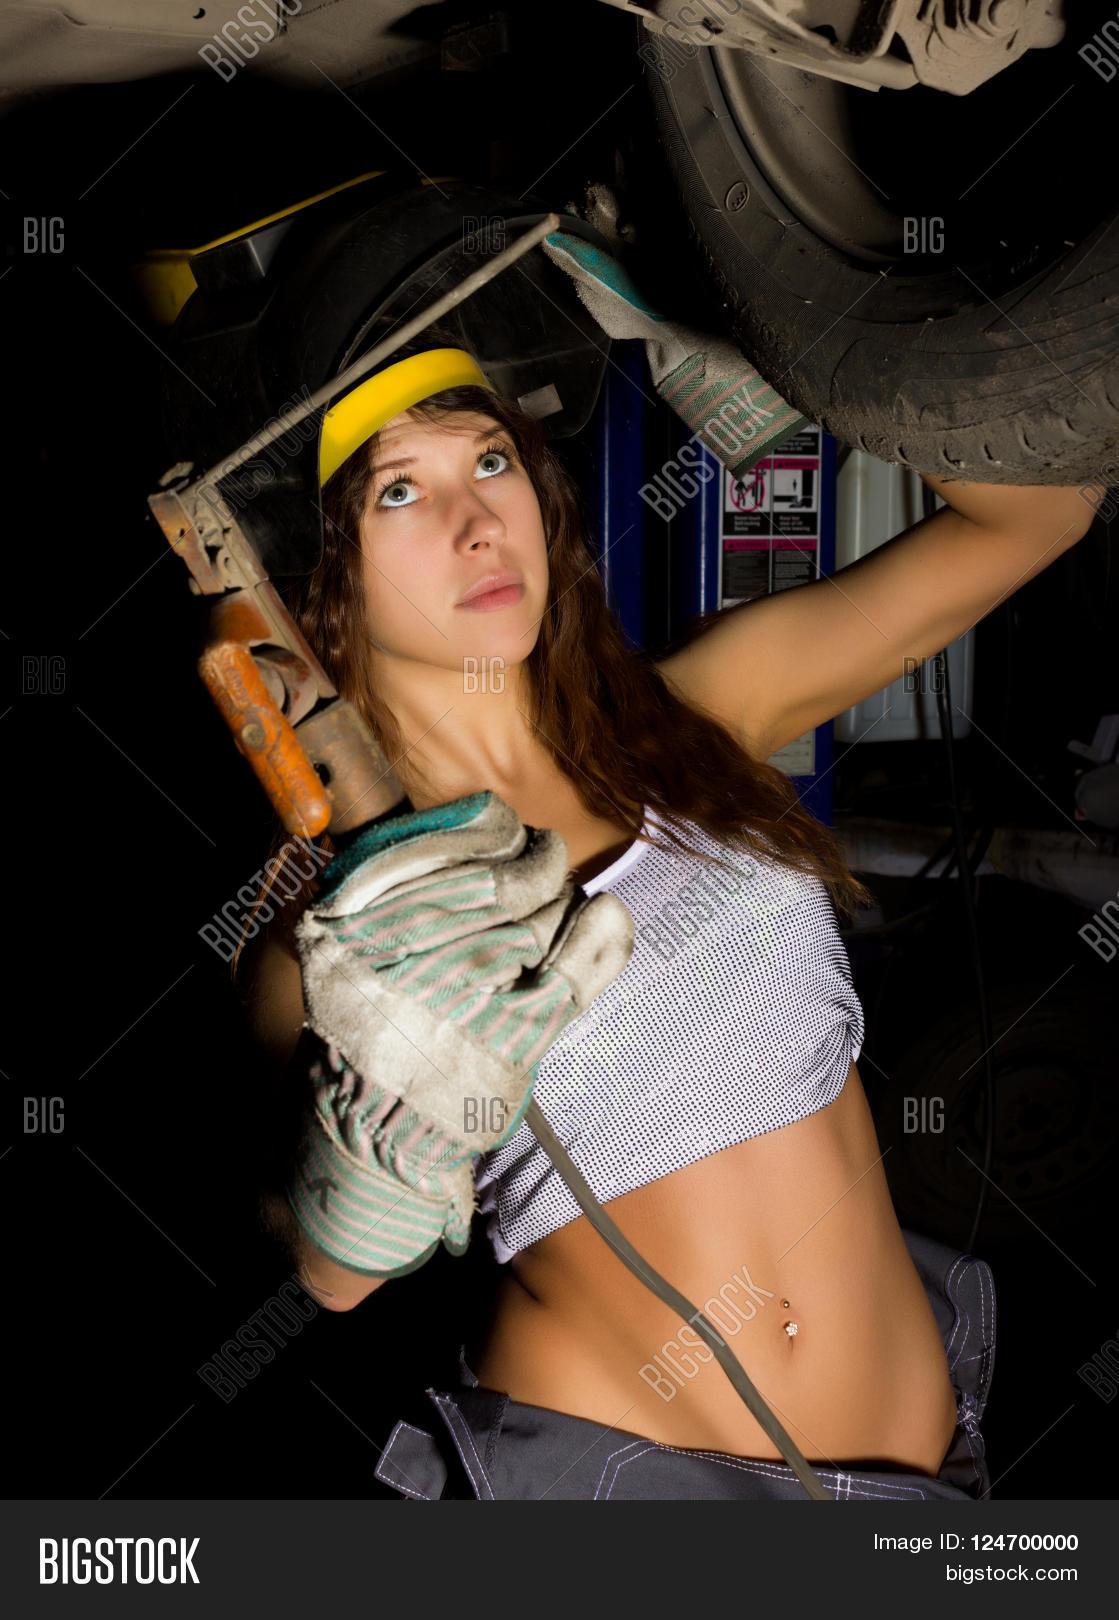 Opinion sexy welding girls something